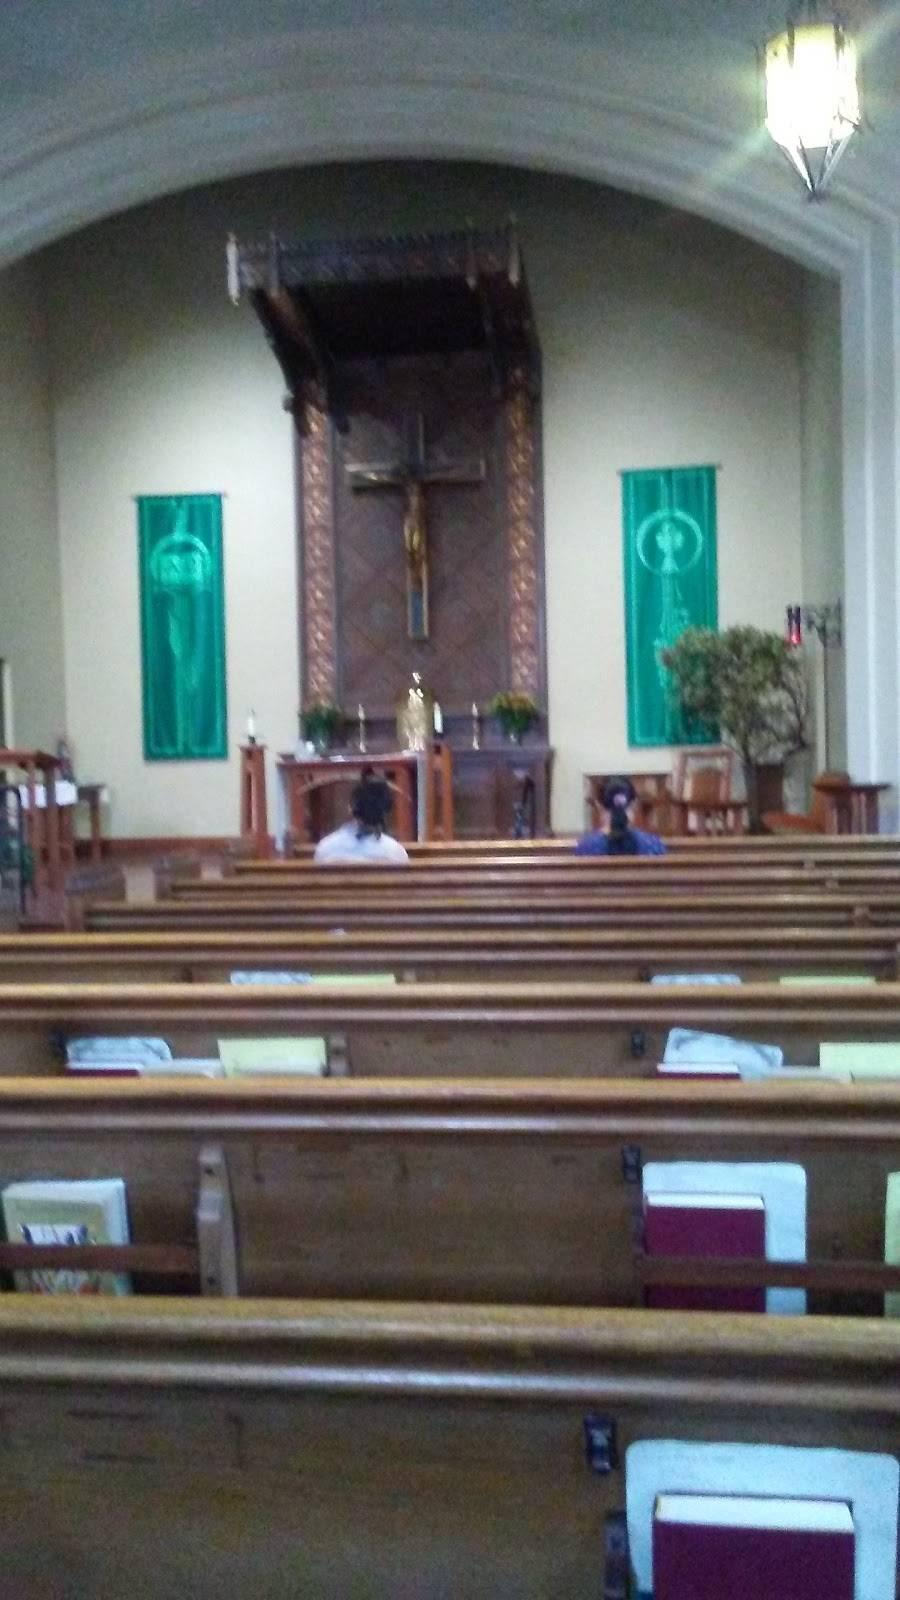 St. Jerome Catholic Church - church    Photo 3 of 5   Address: 308 Carmel Ave, El Cerrito, CA 94530, USA   Phone: (510) 525-0876